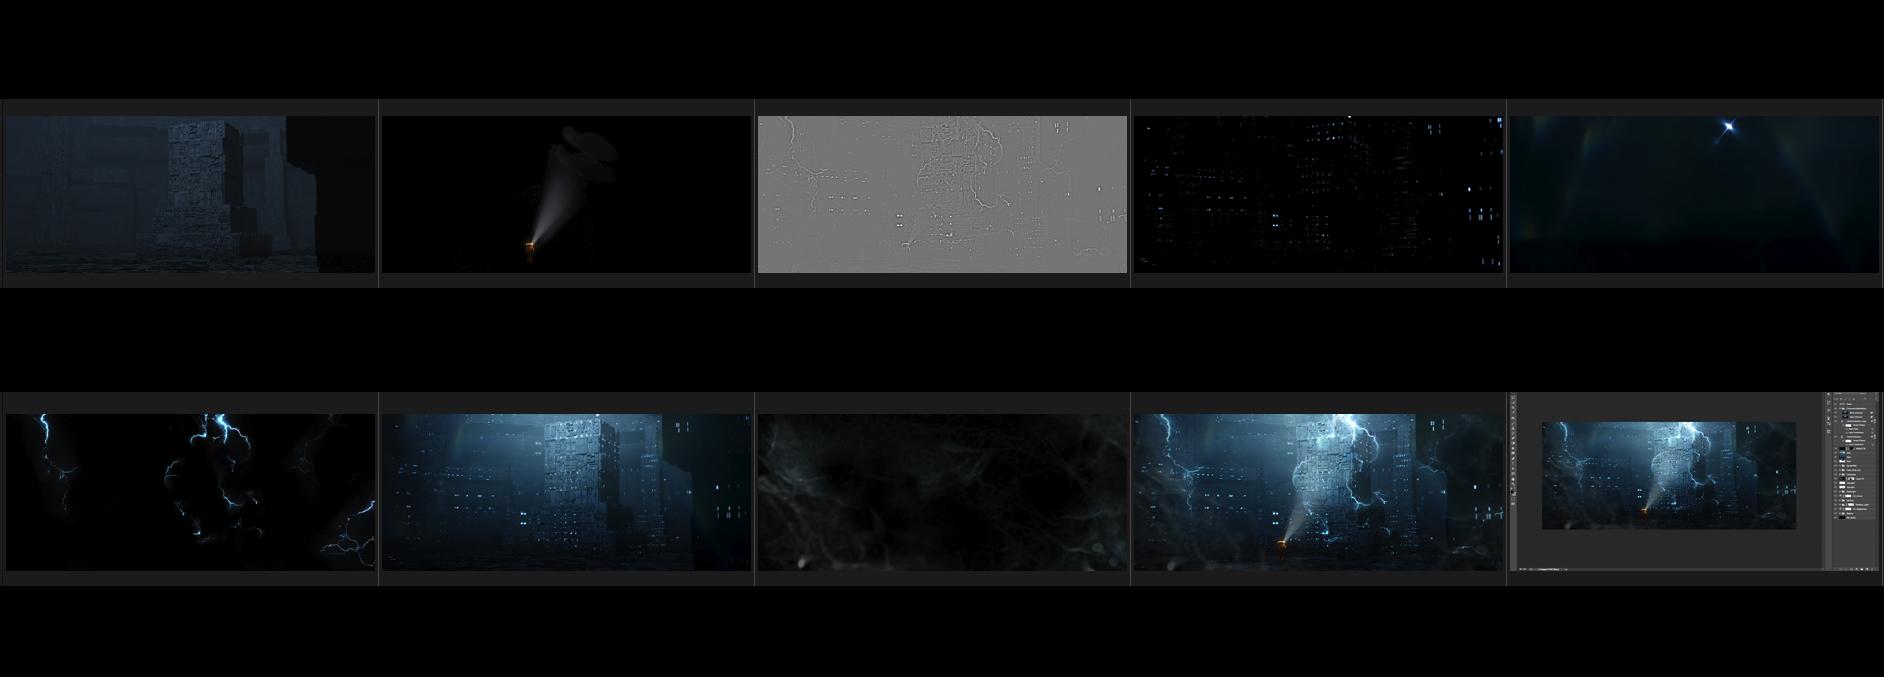 Screen Shot 2017-01-16 at 15.37.41.jpg